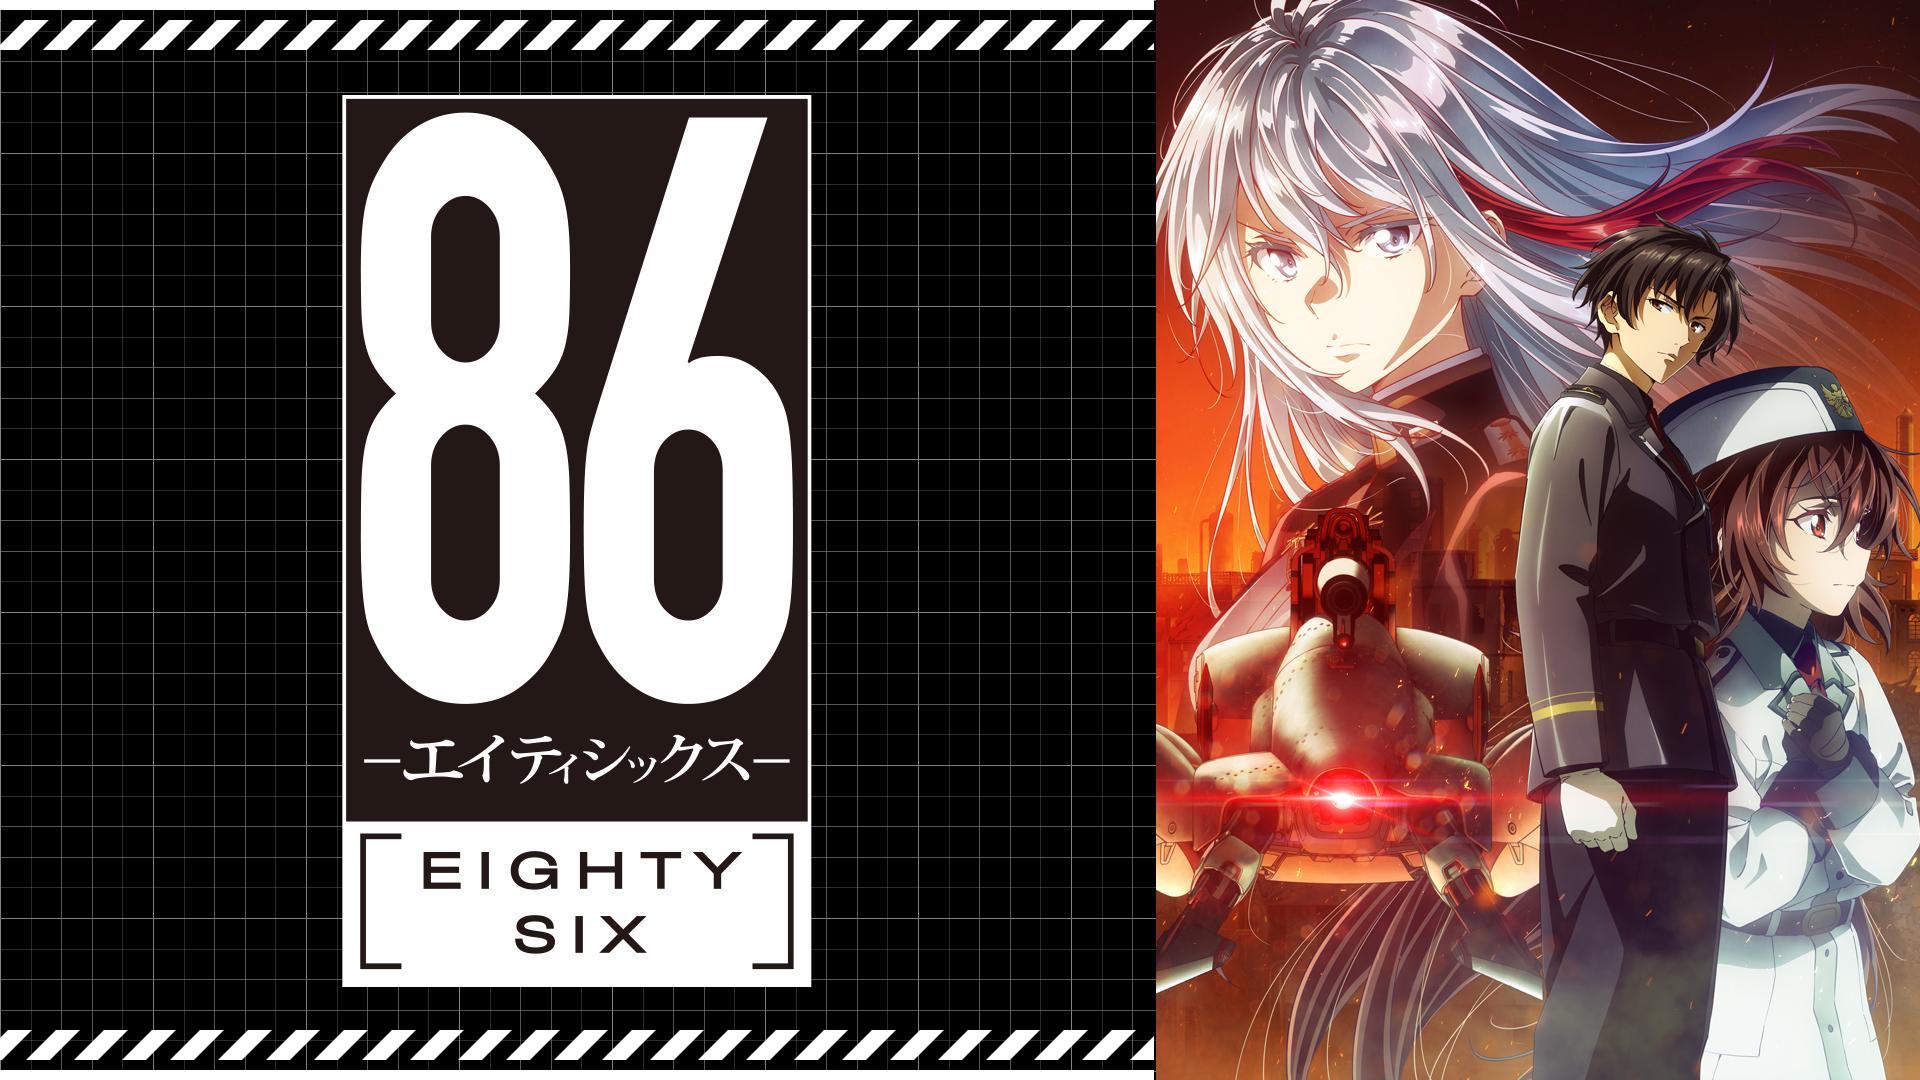 dアニメバナー(86―エイティシックス―)